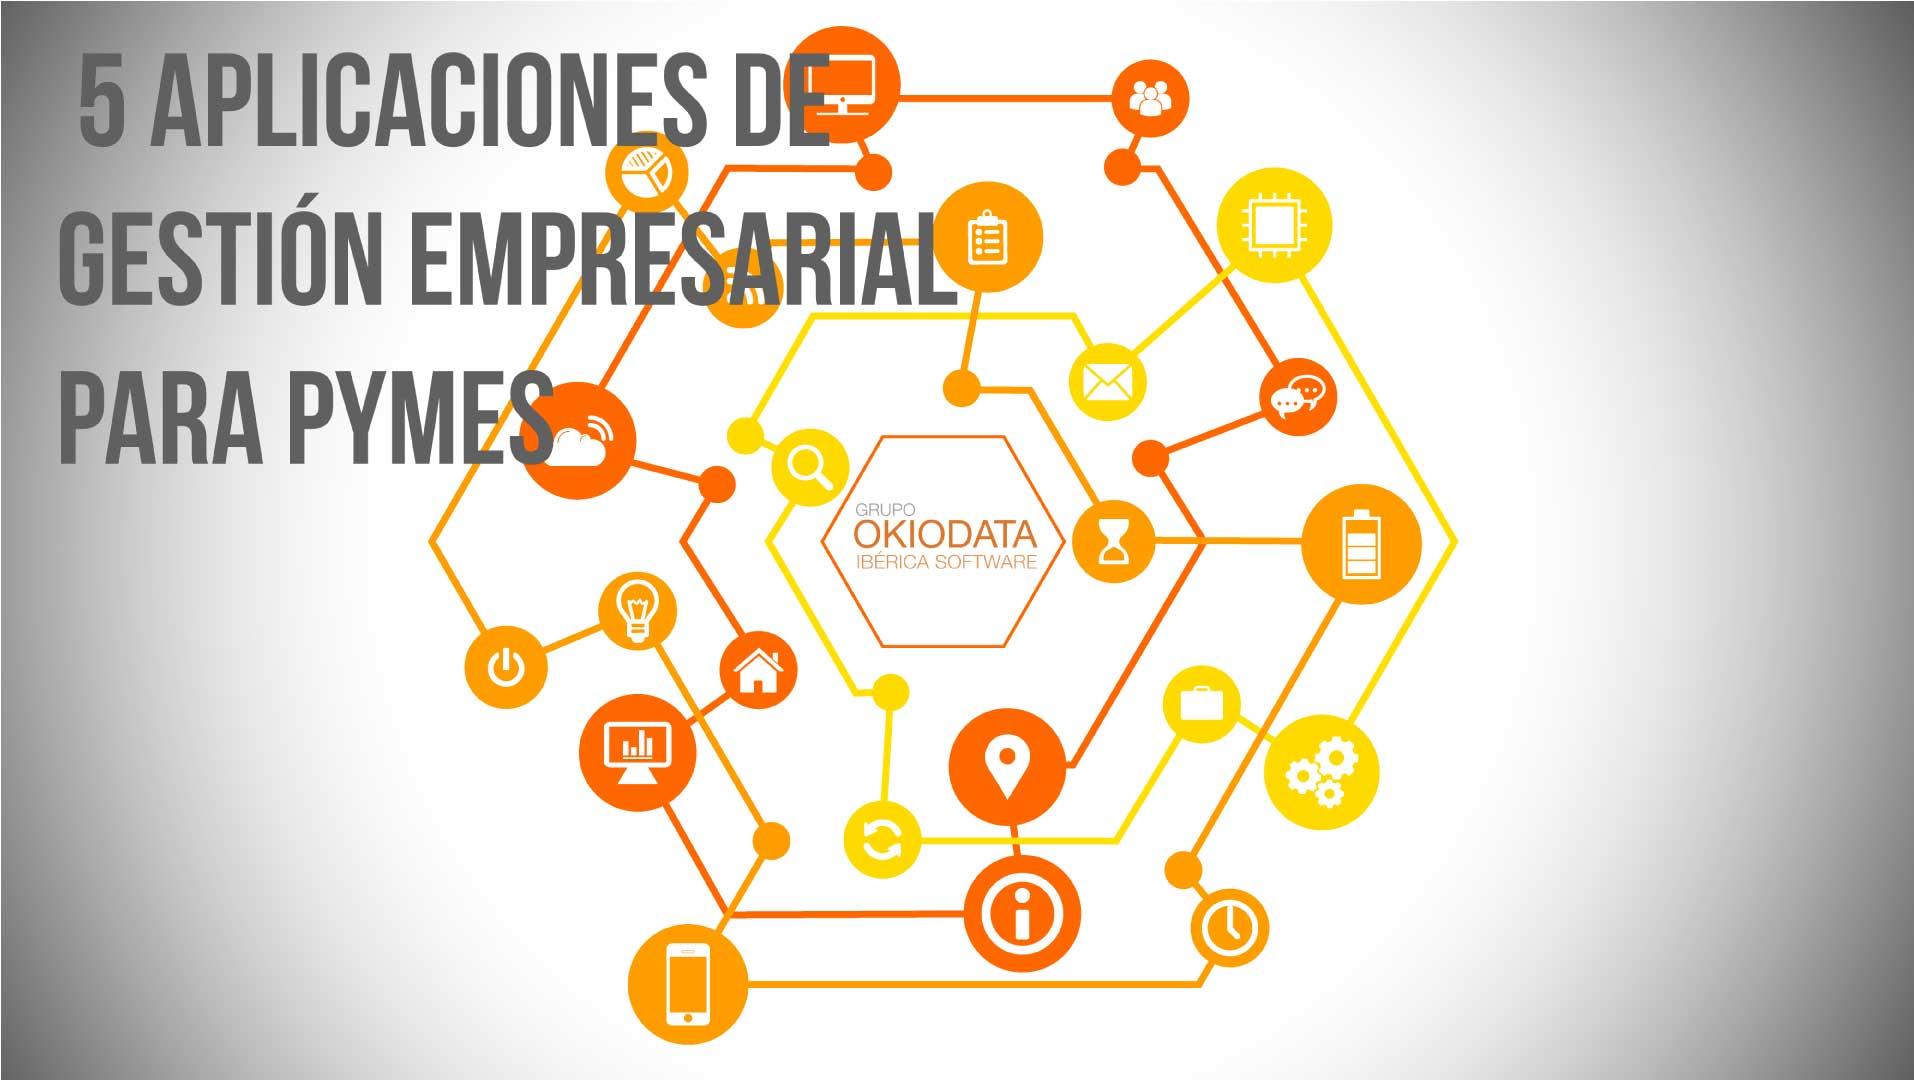 gestion empresarial banner